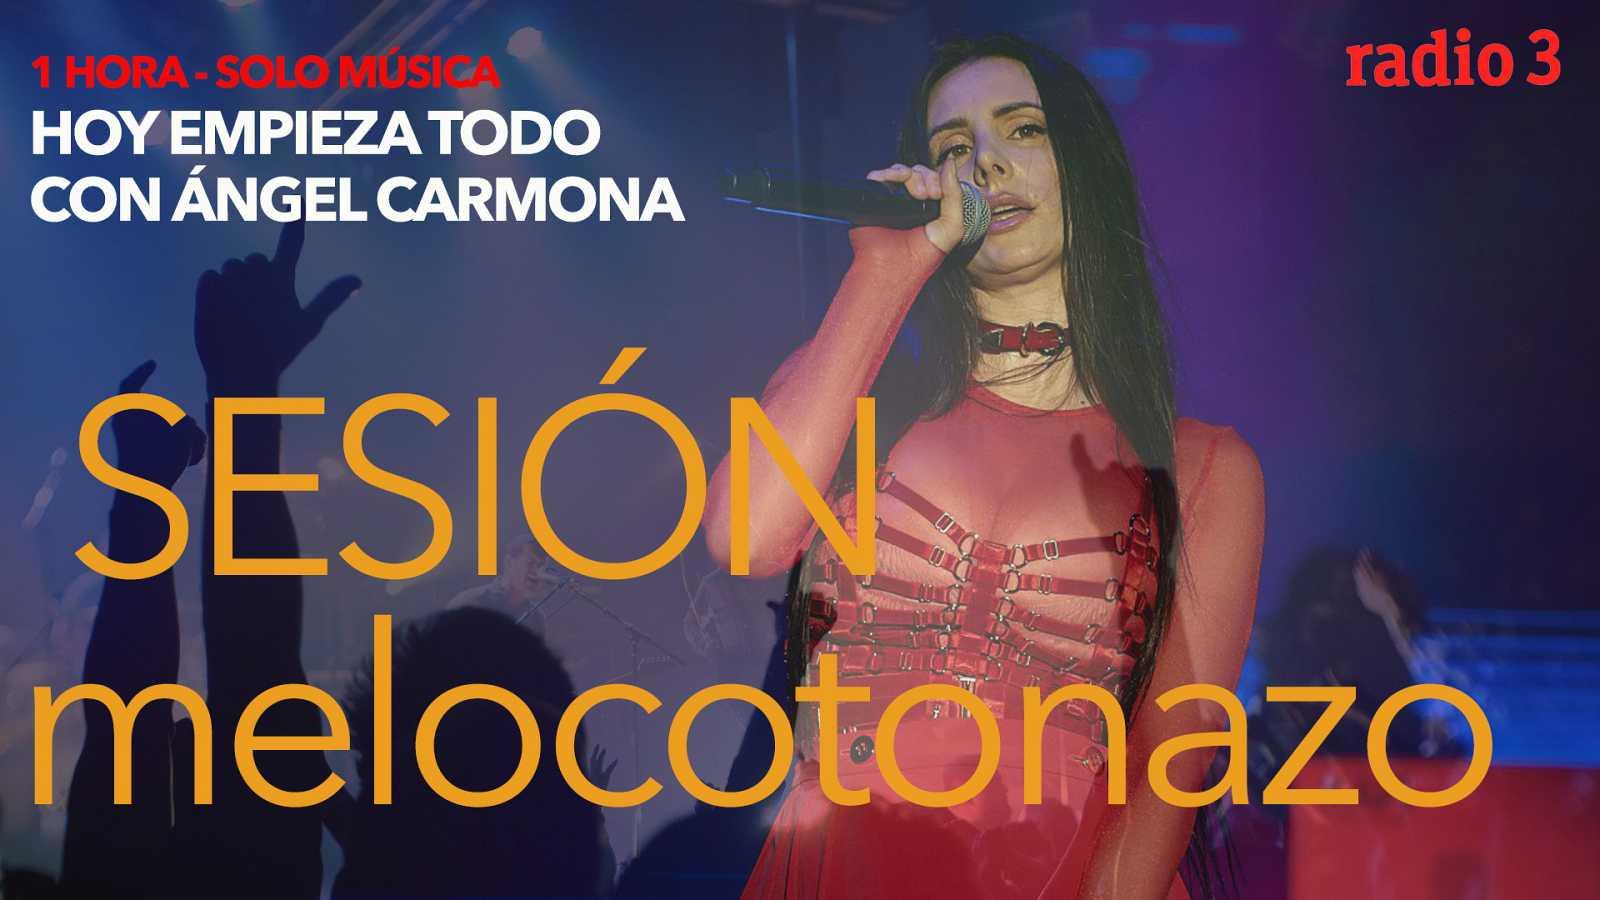 Hoy empieza todo con Ángel Carmona - #SesiónMelocotonazo: Charly García, Mala Rodríguez, The Weeknd... - 23/10/20 - escuchar ahora